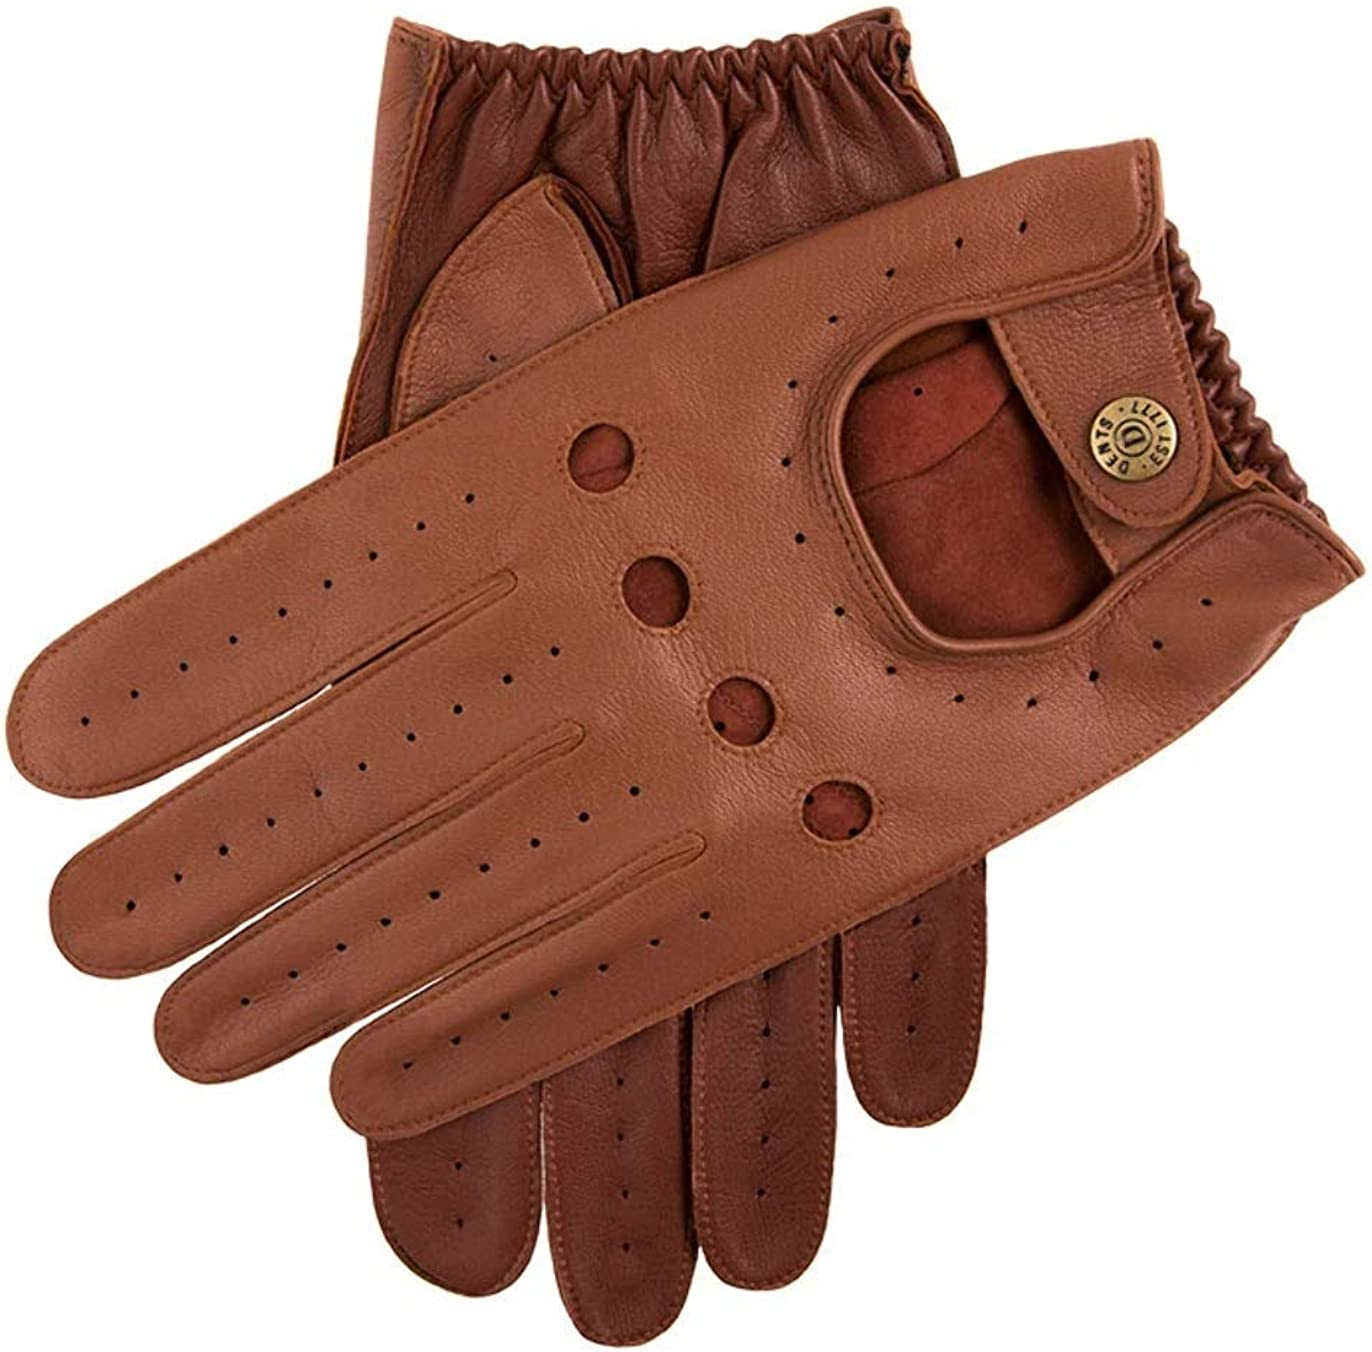 Dents Mens Leather Driving Gloves Houston Mall Cognac English Tan Fashion 5-1021